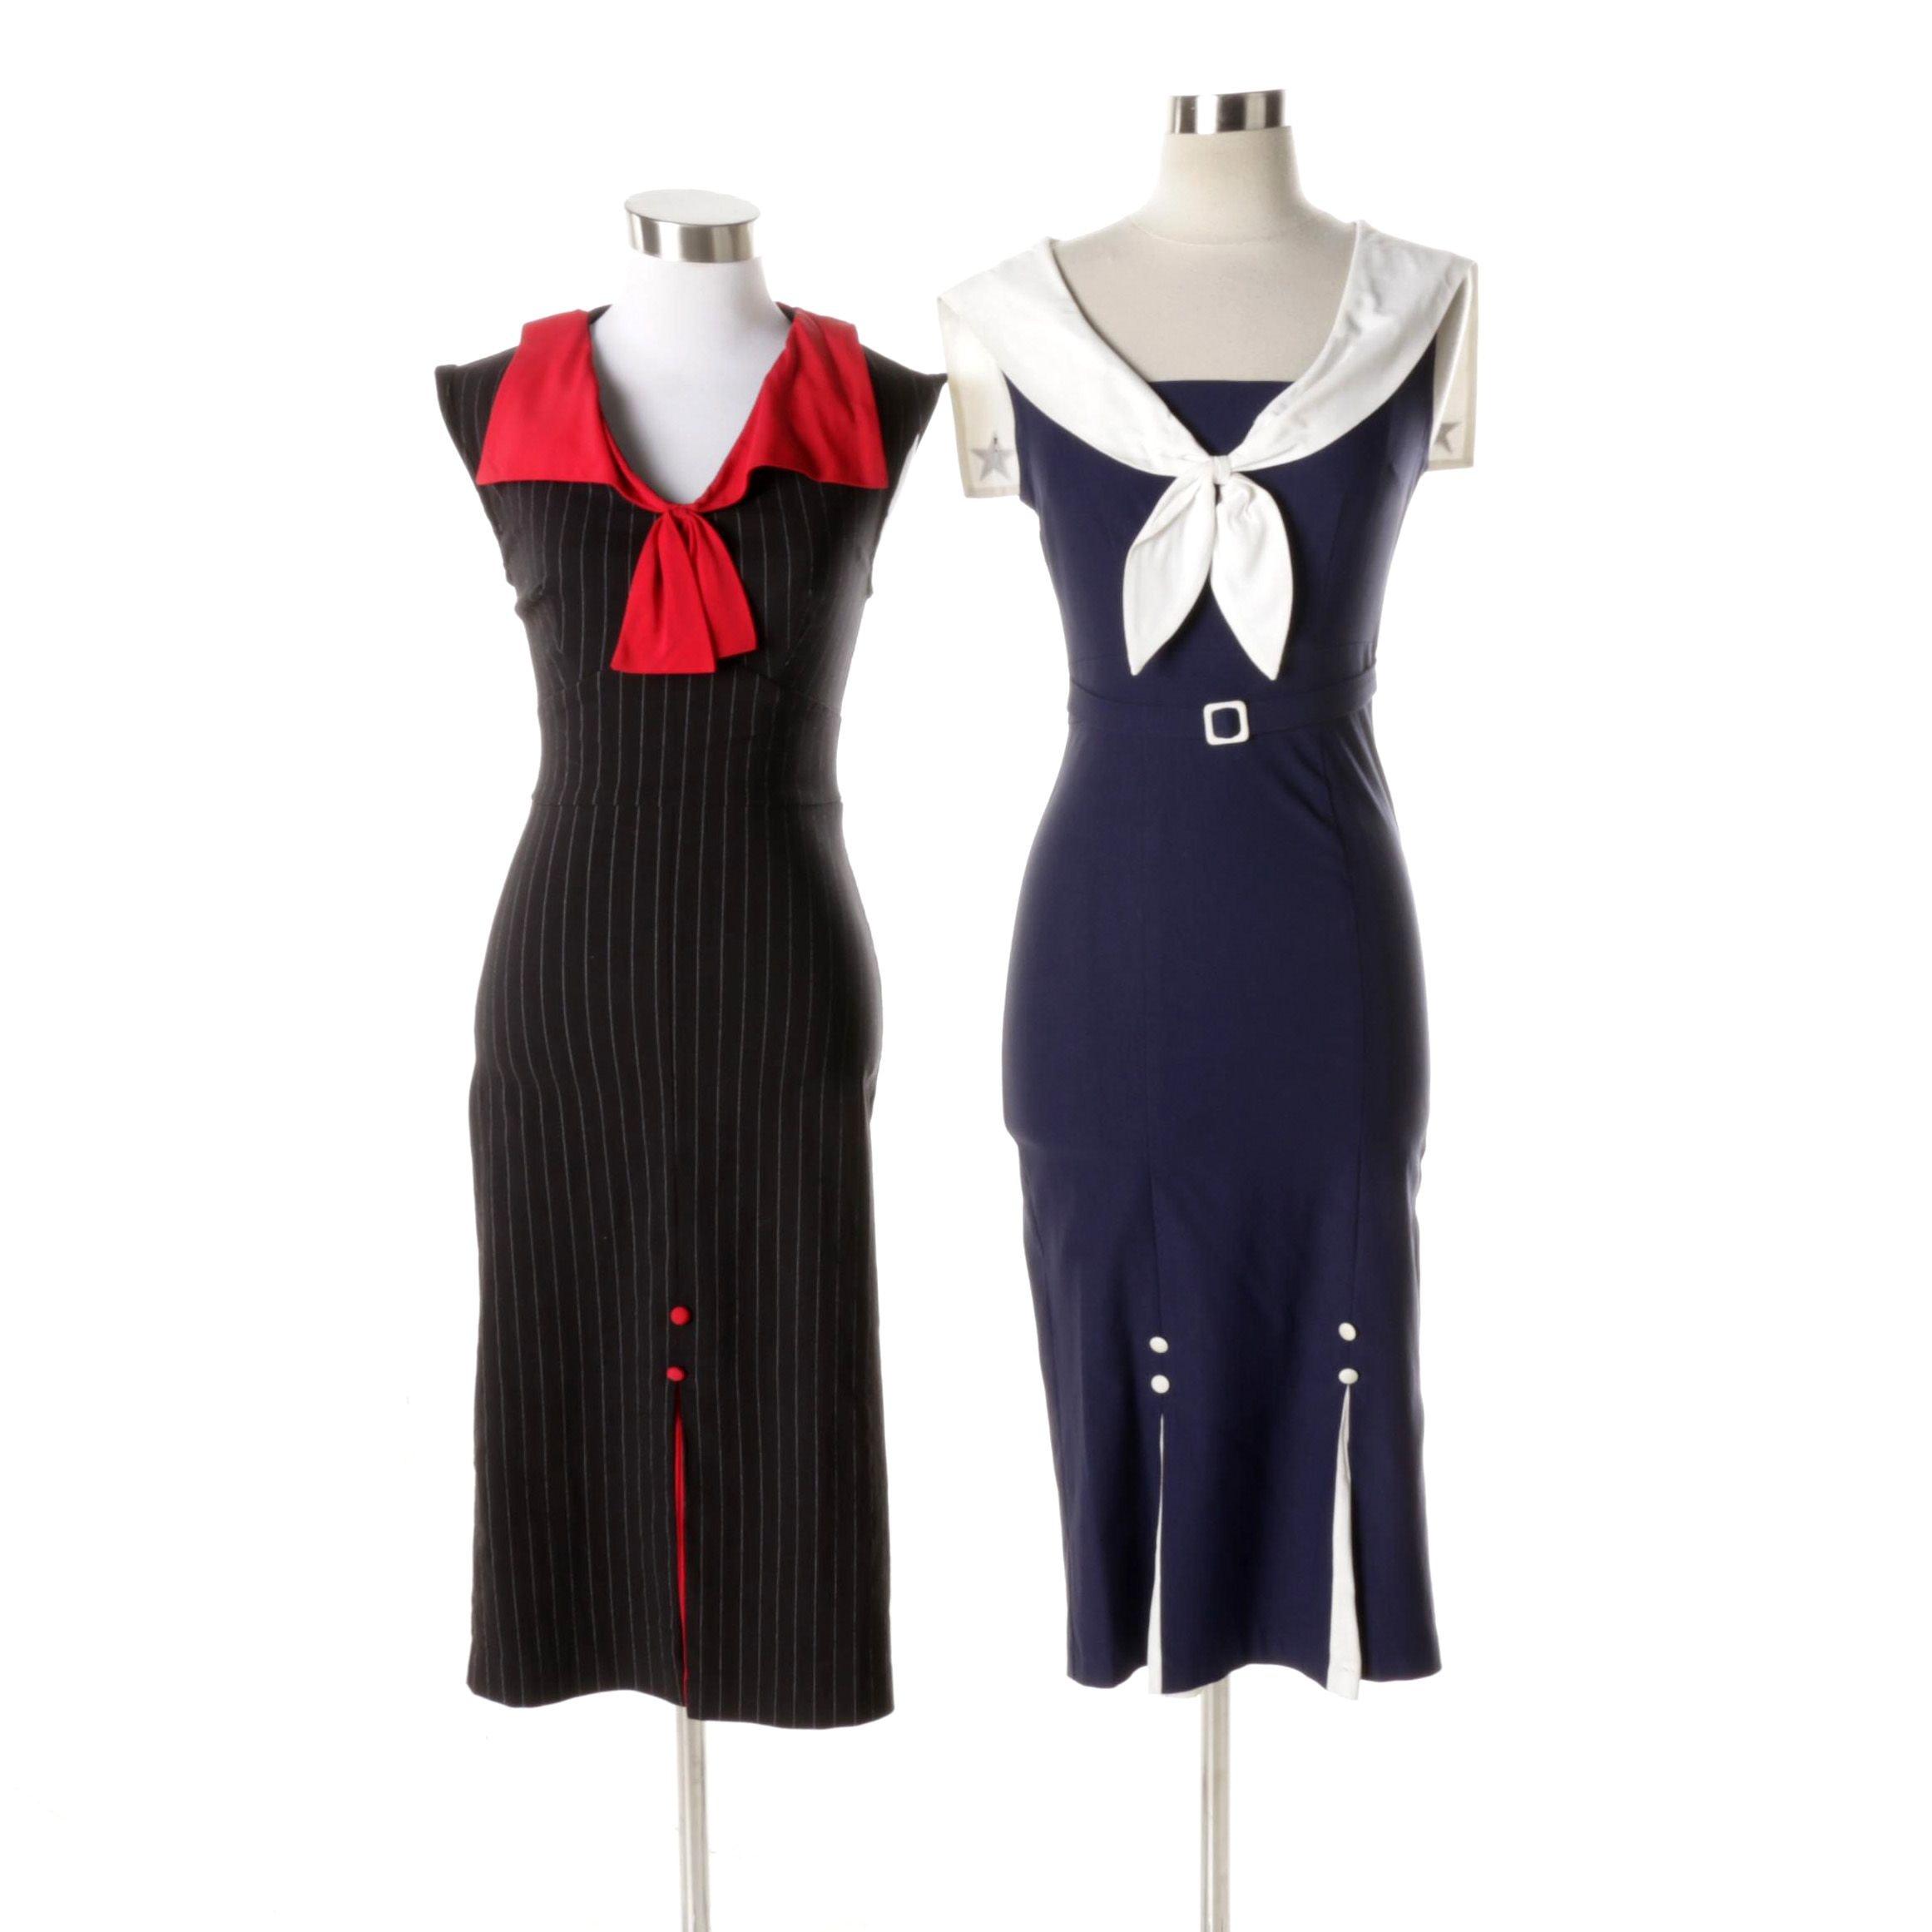 Retro Sheath Dresses